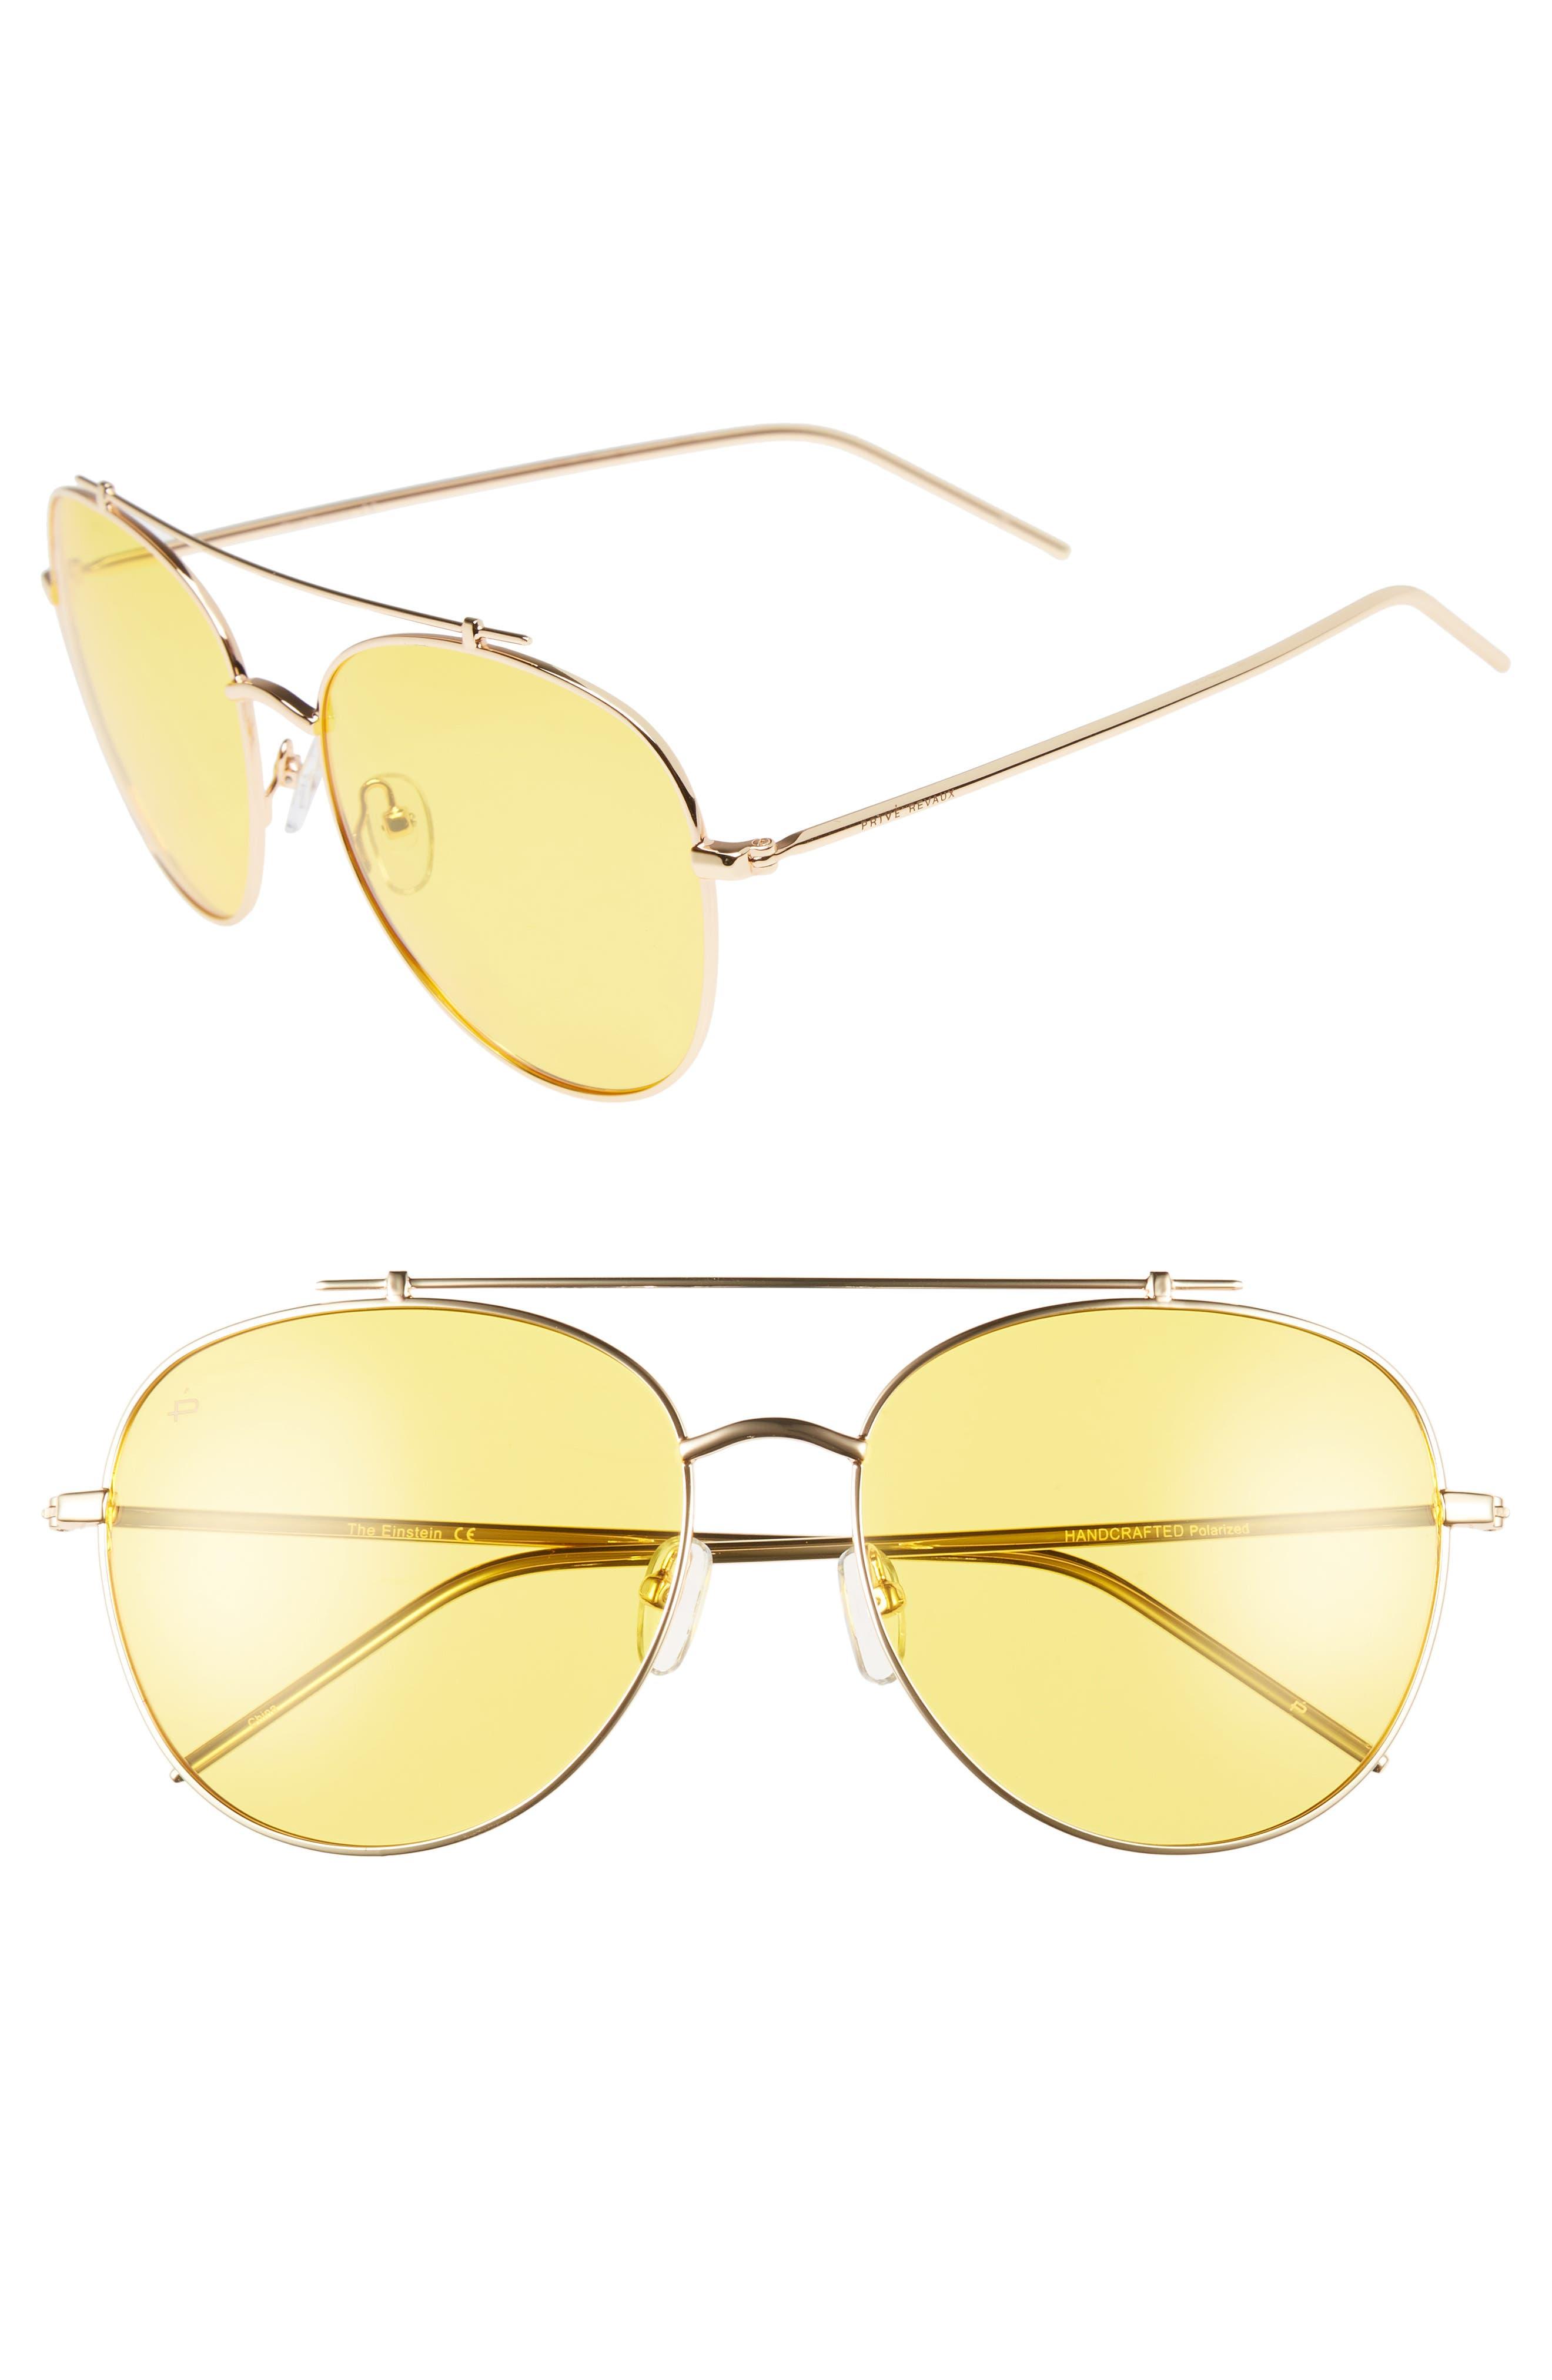 Privé Revaux The Einstein 58mm Polarized Aviator Sunglasses,                             Main thumbnail 1, color,                             Yellow